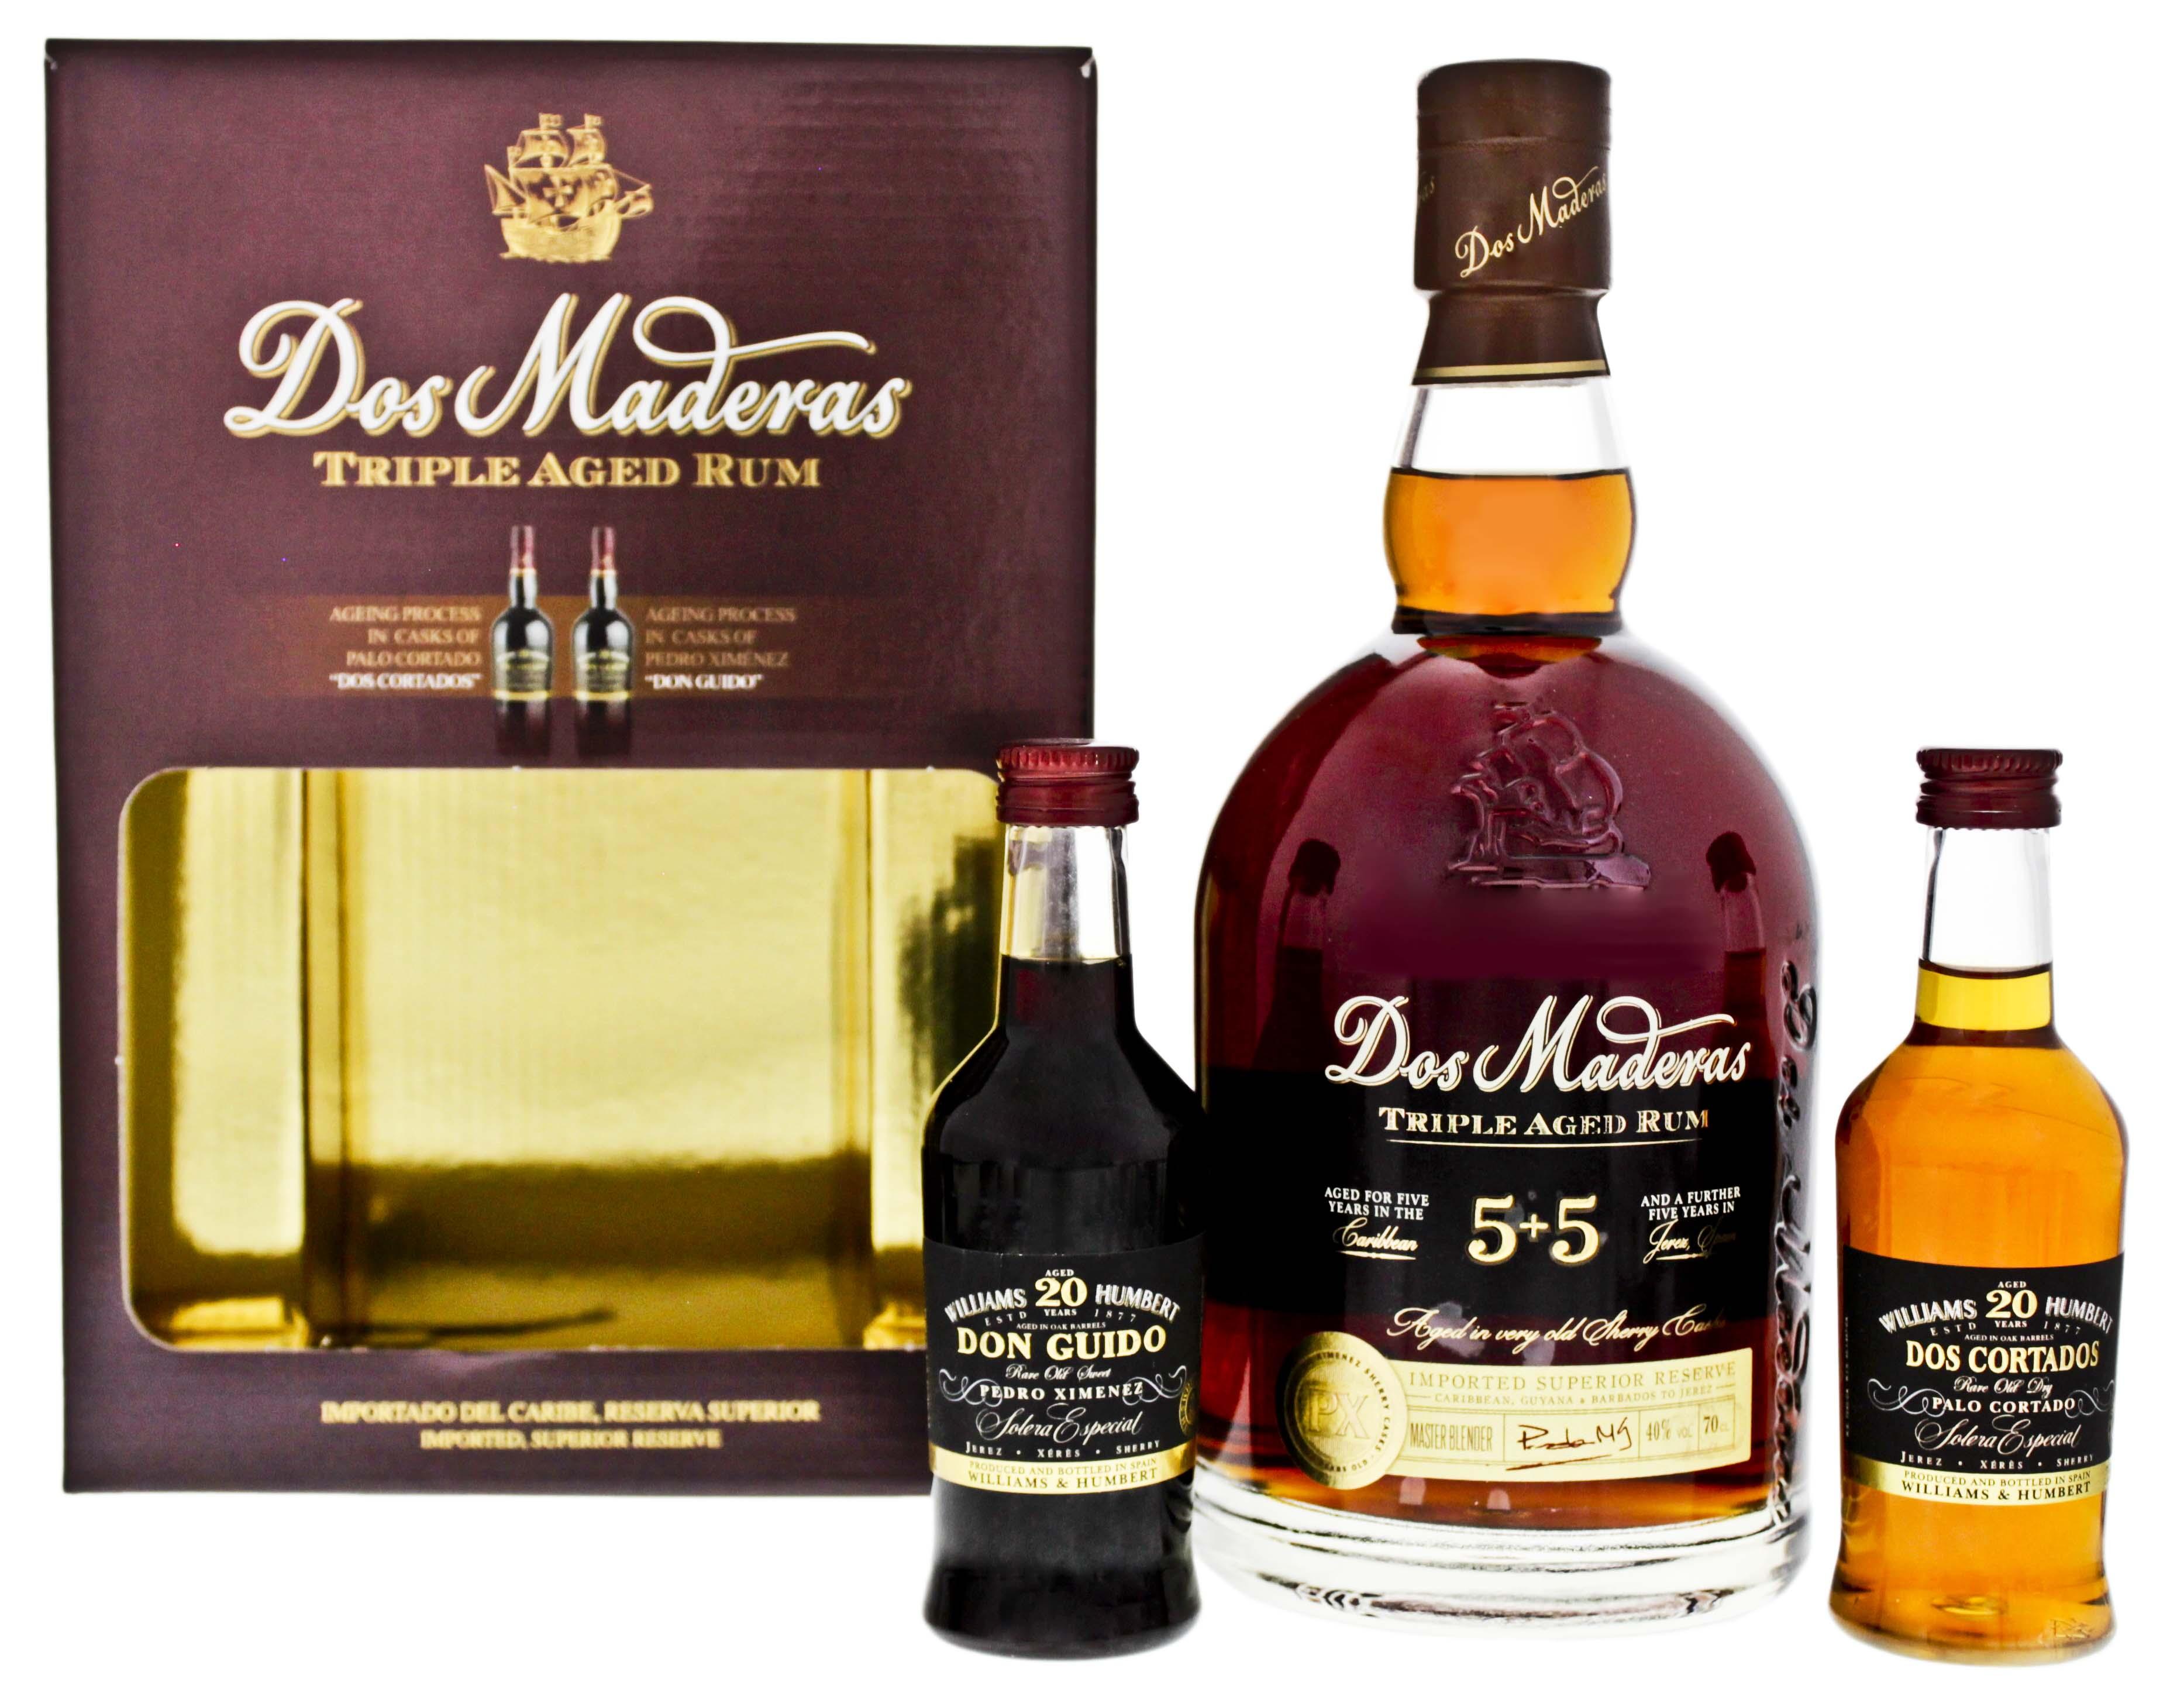 Dos Maderas PX Triple Aged 5+5 0,7L + Sherry (0,7L + 2 x 0,1L)